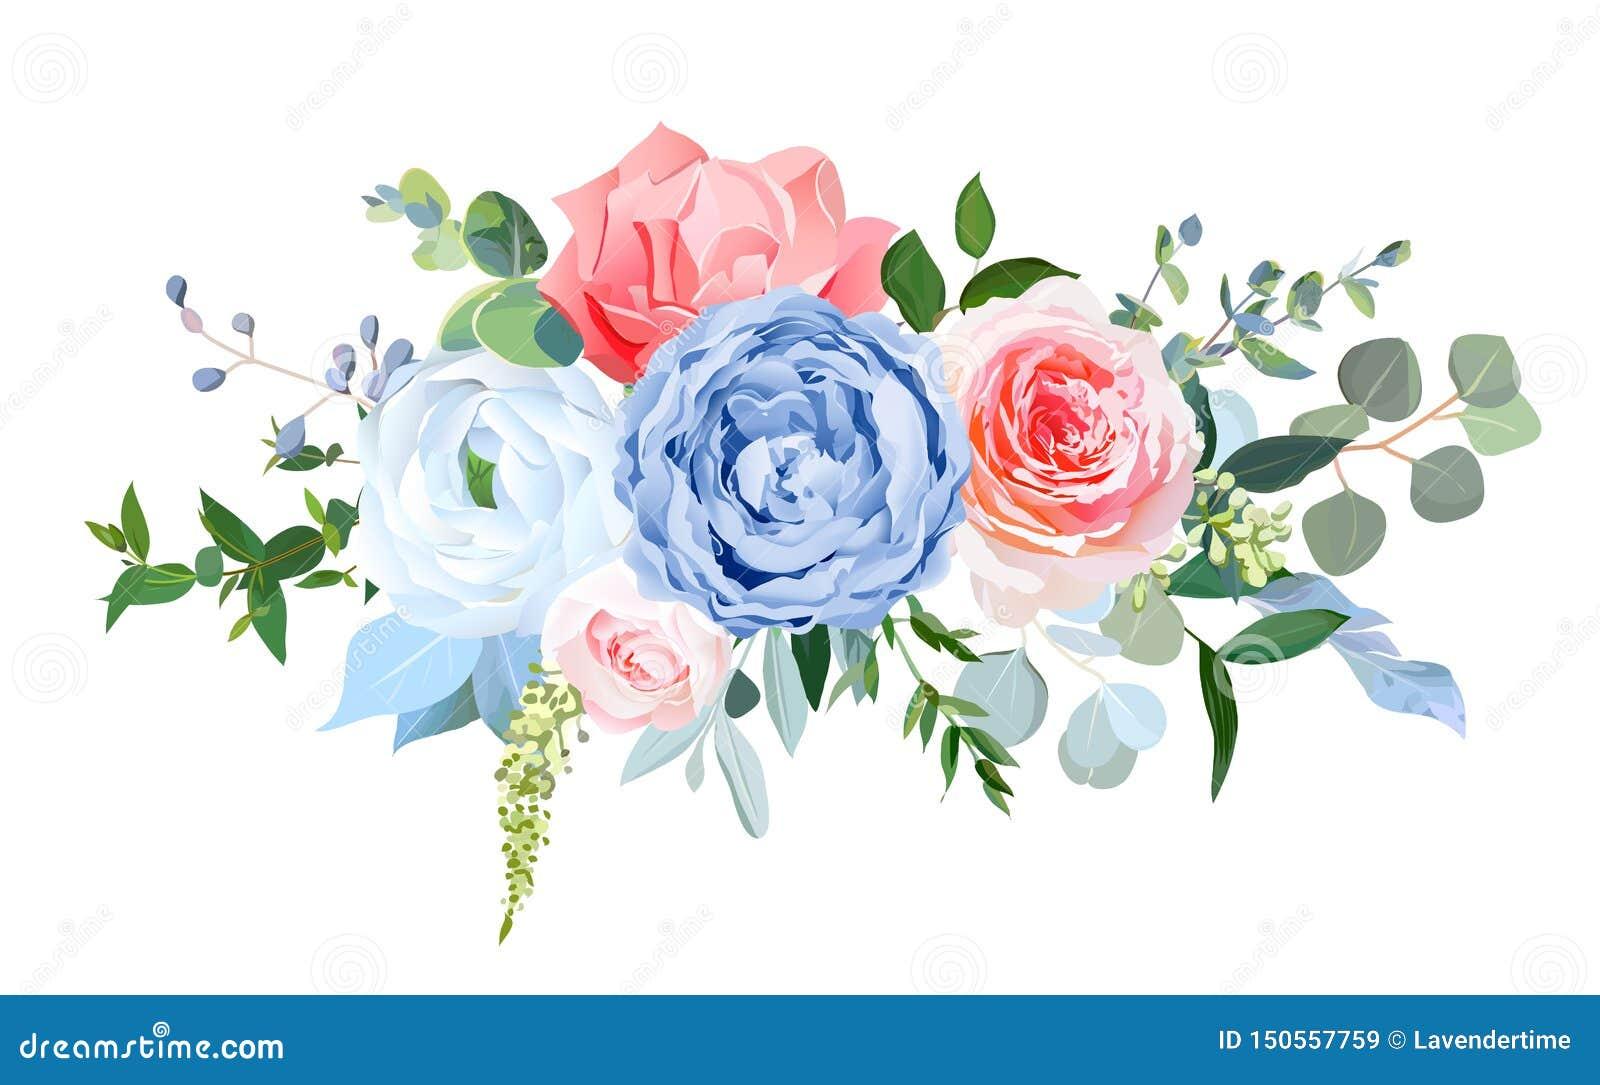 Wedding Seasonal Flowers Floral Composition Stock Vector Illustration Of Elegant Border 150557759